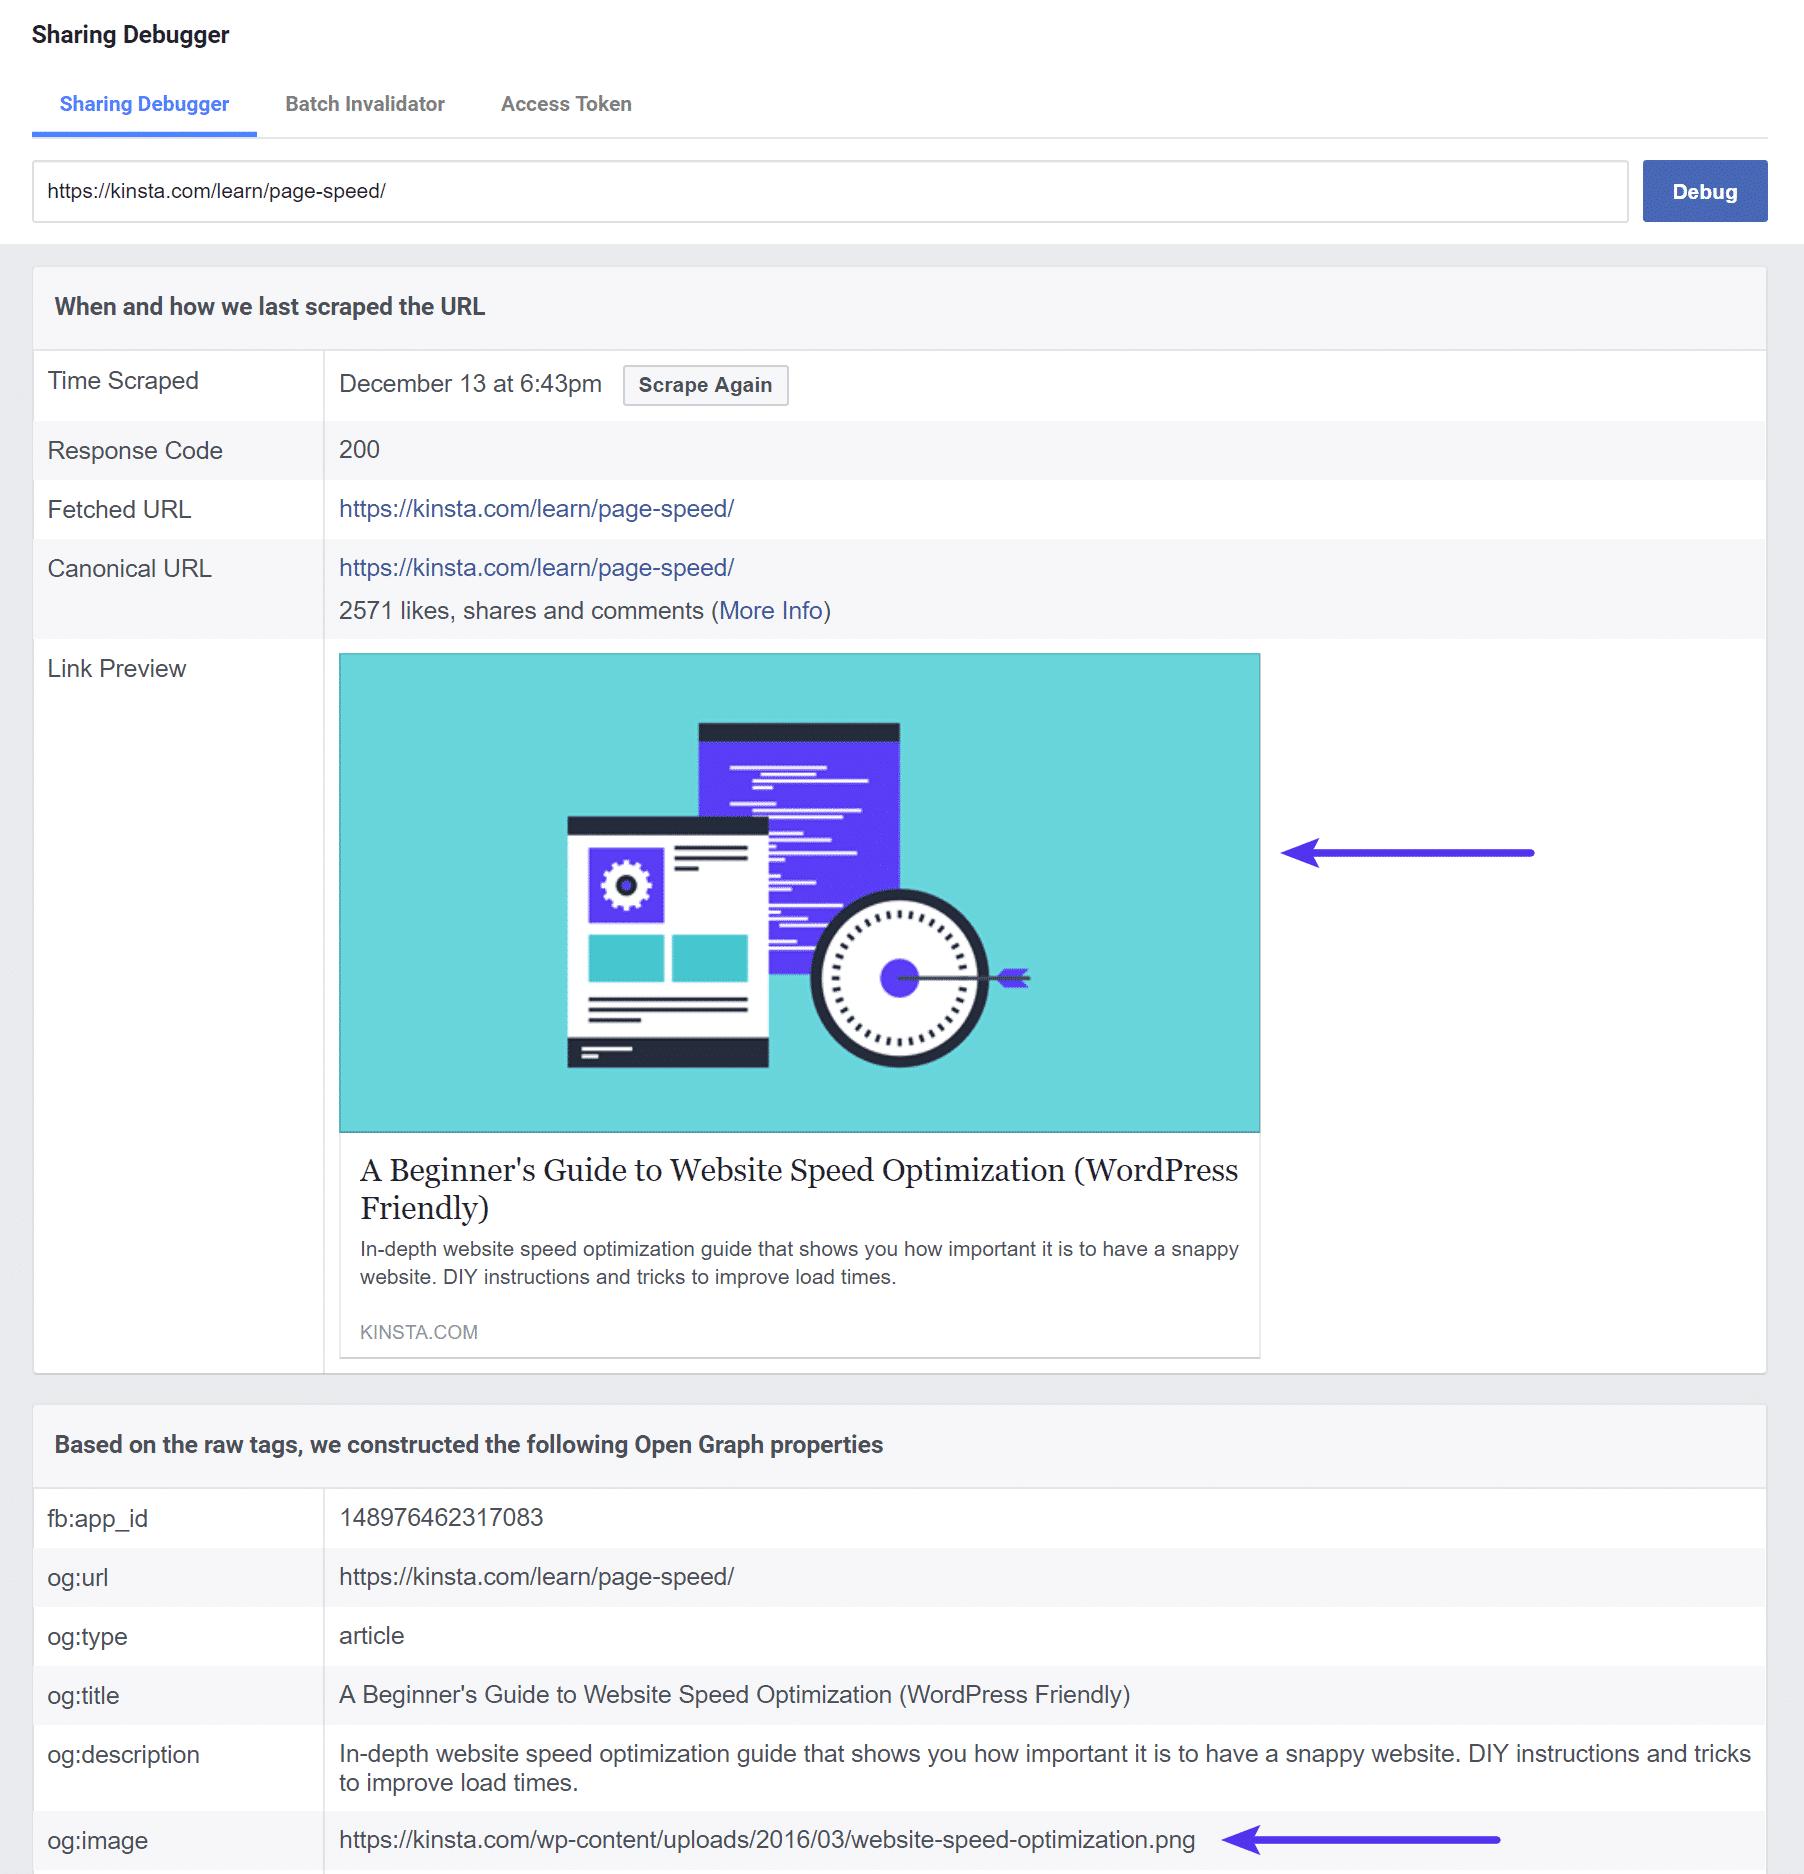 Facebook Debuggerで表示される従来の画像のURL